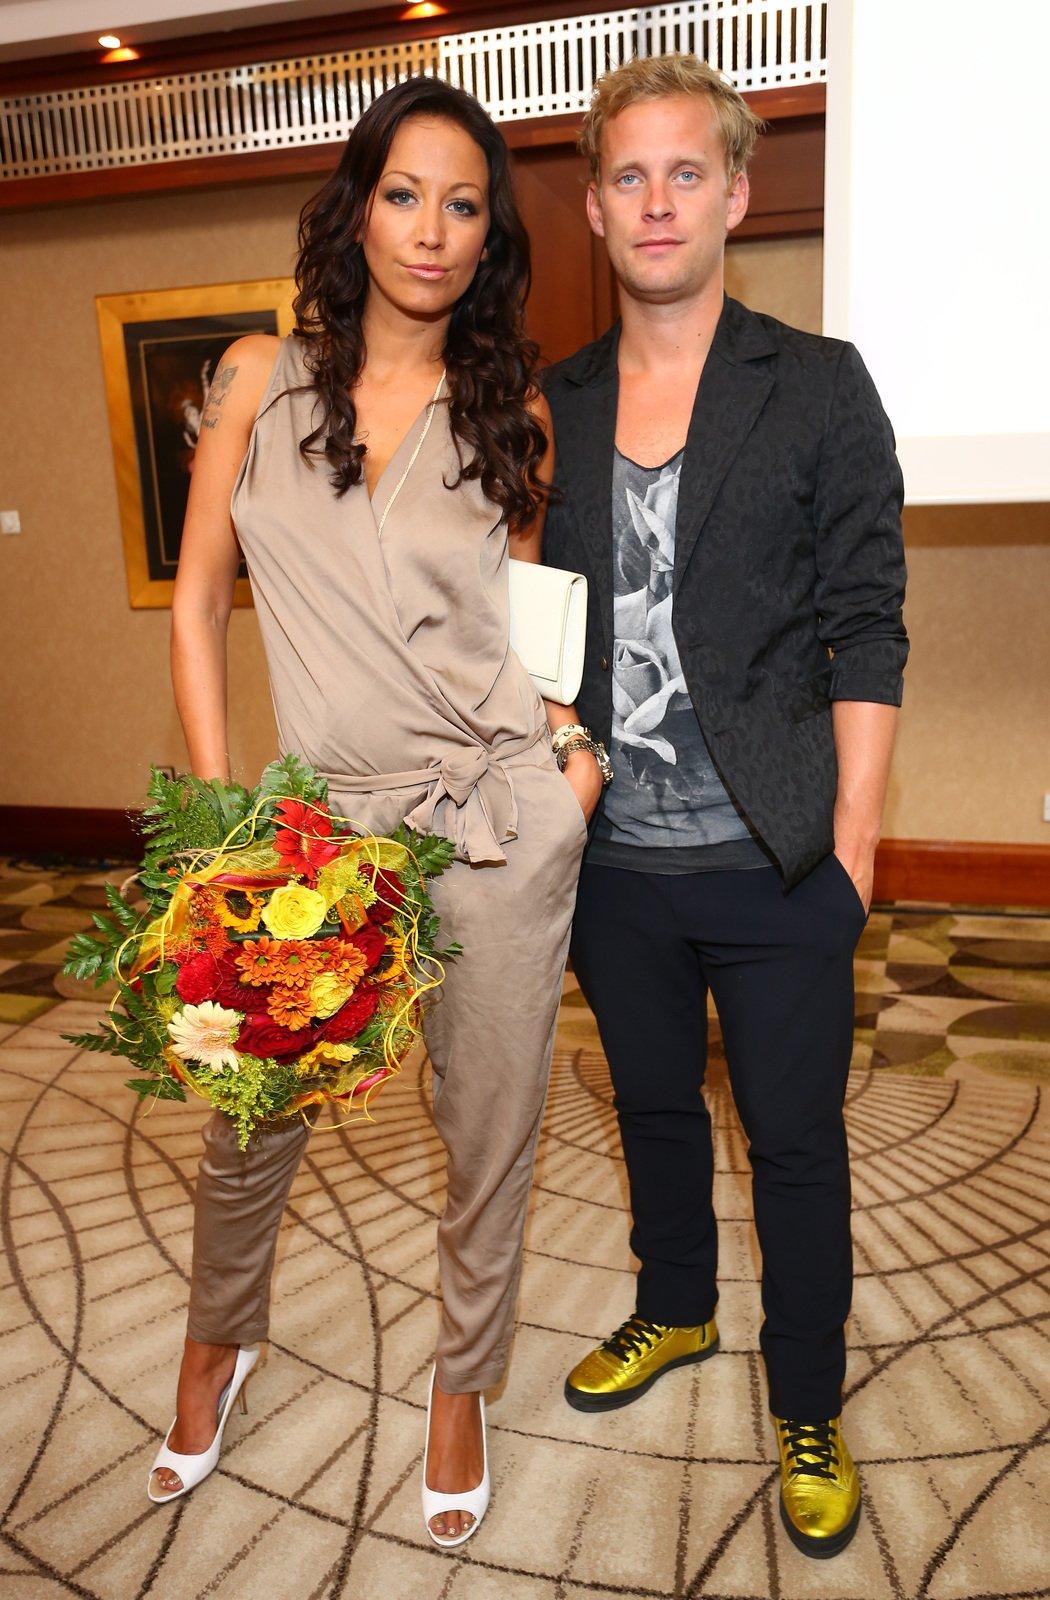 Jakub Prachař s Agátou Hanychovou